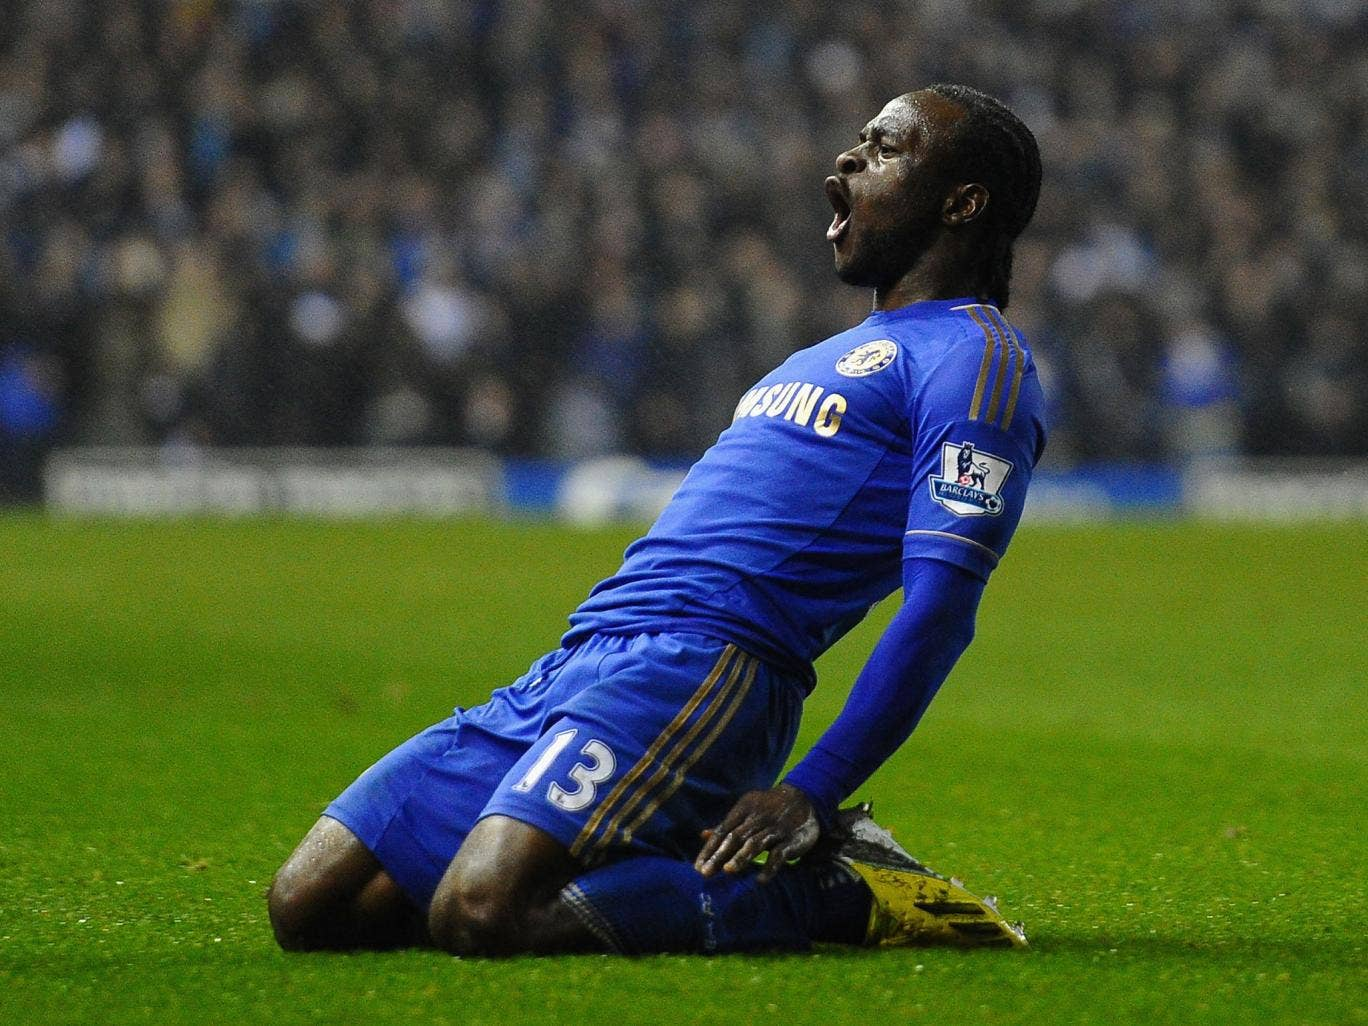 Victor Moses of Chelsea celebrates scoring his team's third goal